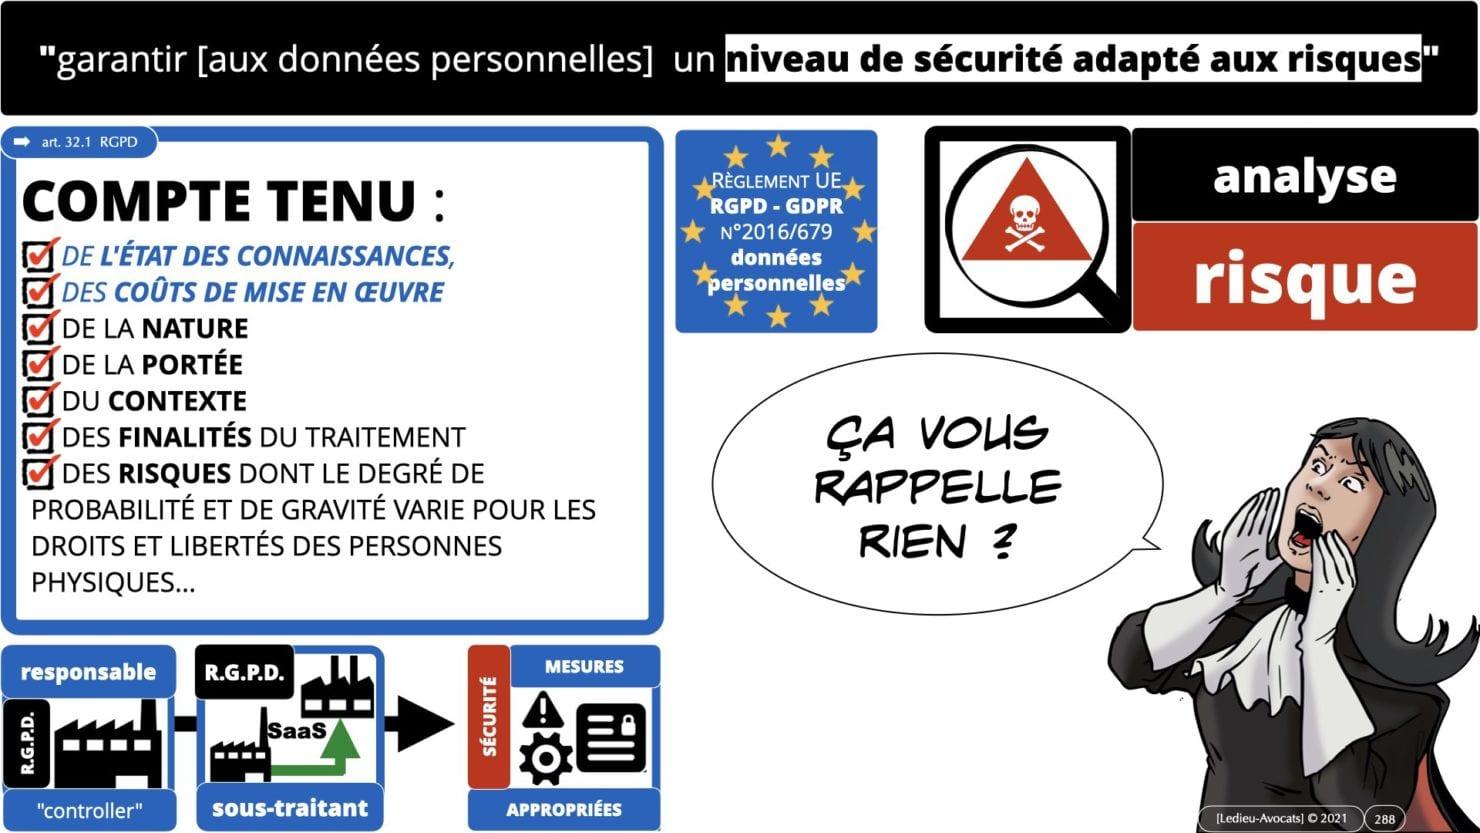 RGPD e-Privacy principes actualité jurisprudence ©Ledieu-Avocats 25-06-2021.288